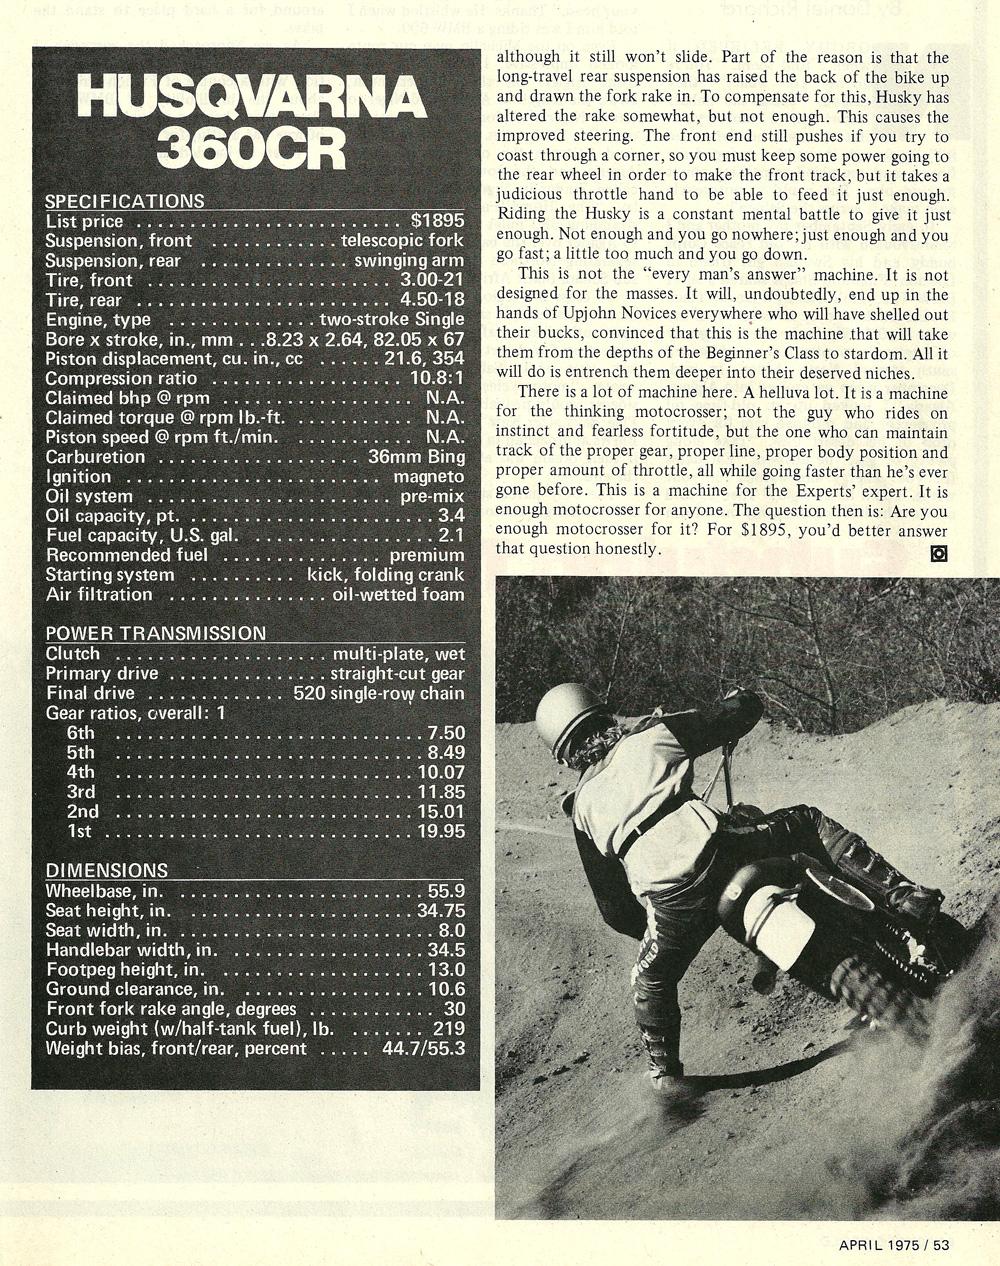 1975 Husqvarna 360CR road test 06.jpg